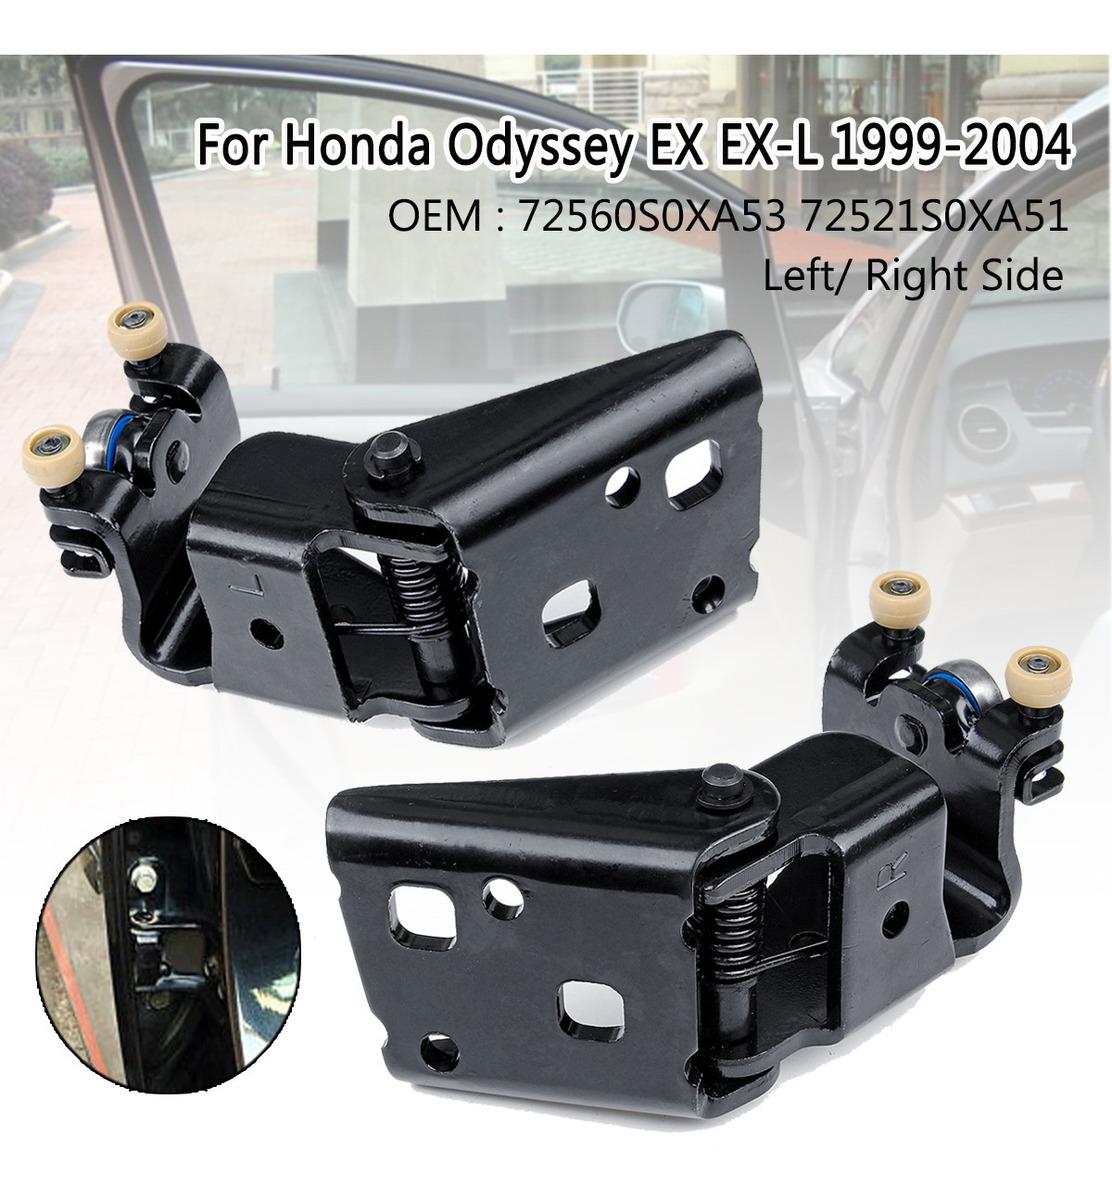 Right Power Sliding Door Center Roller 72521-S0X-A51 for 1999-2004 Honda Odyssey